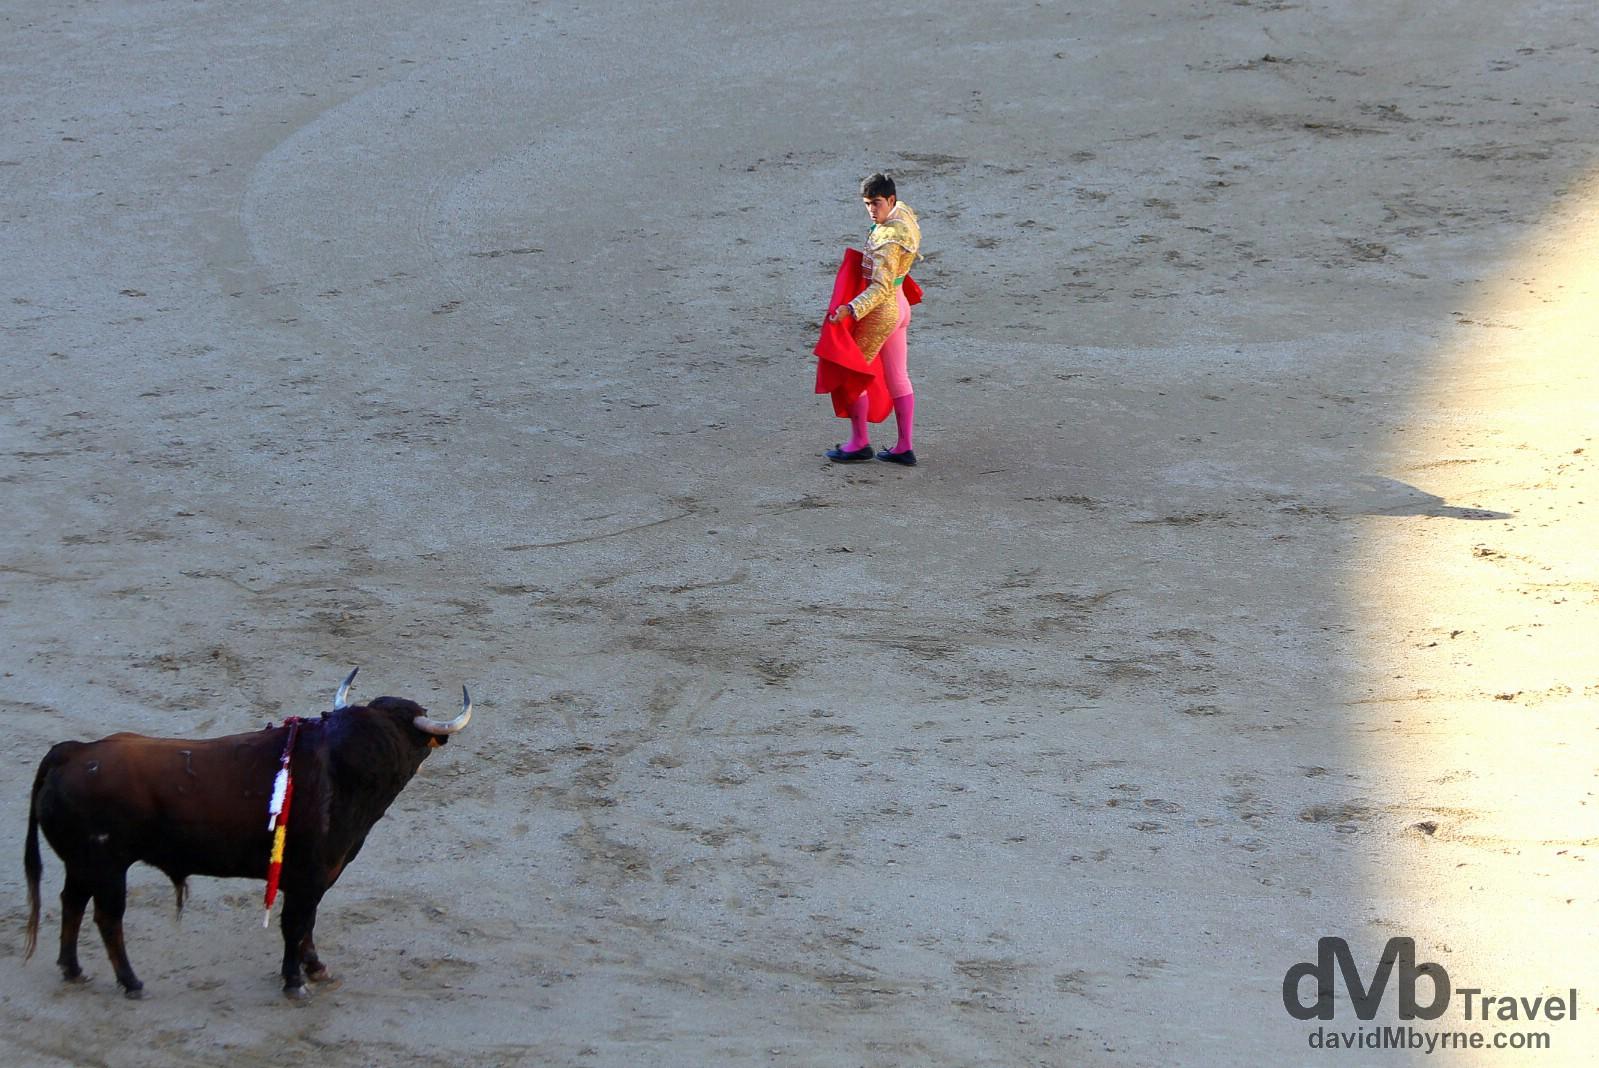 Bullfighting in Plaza de Toros, Las Ventas, Madrid, Spain. June 15th, 2014.